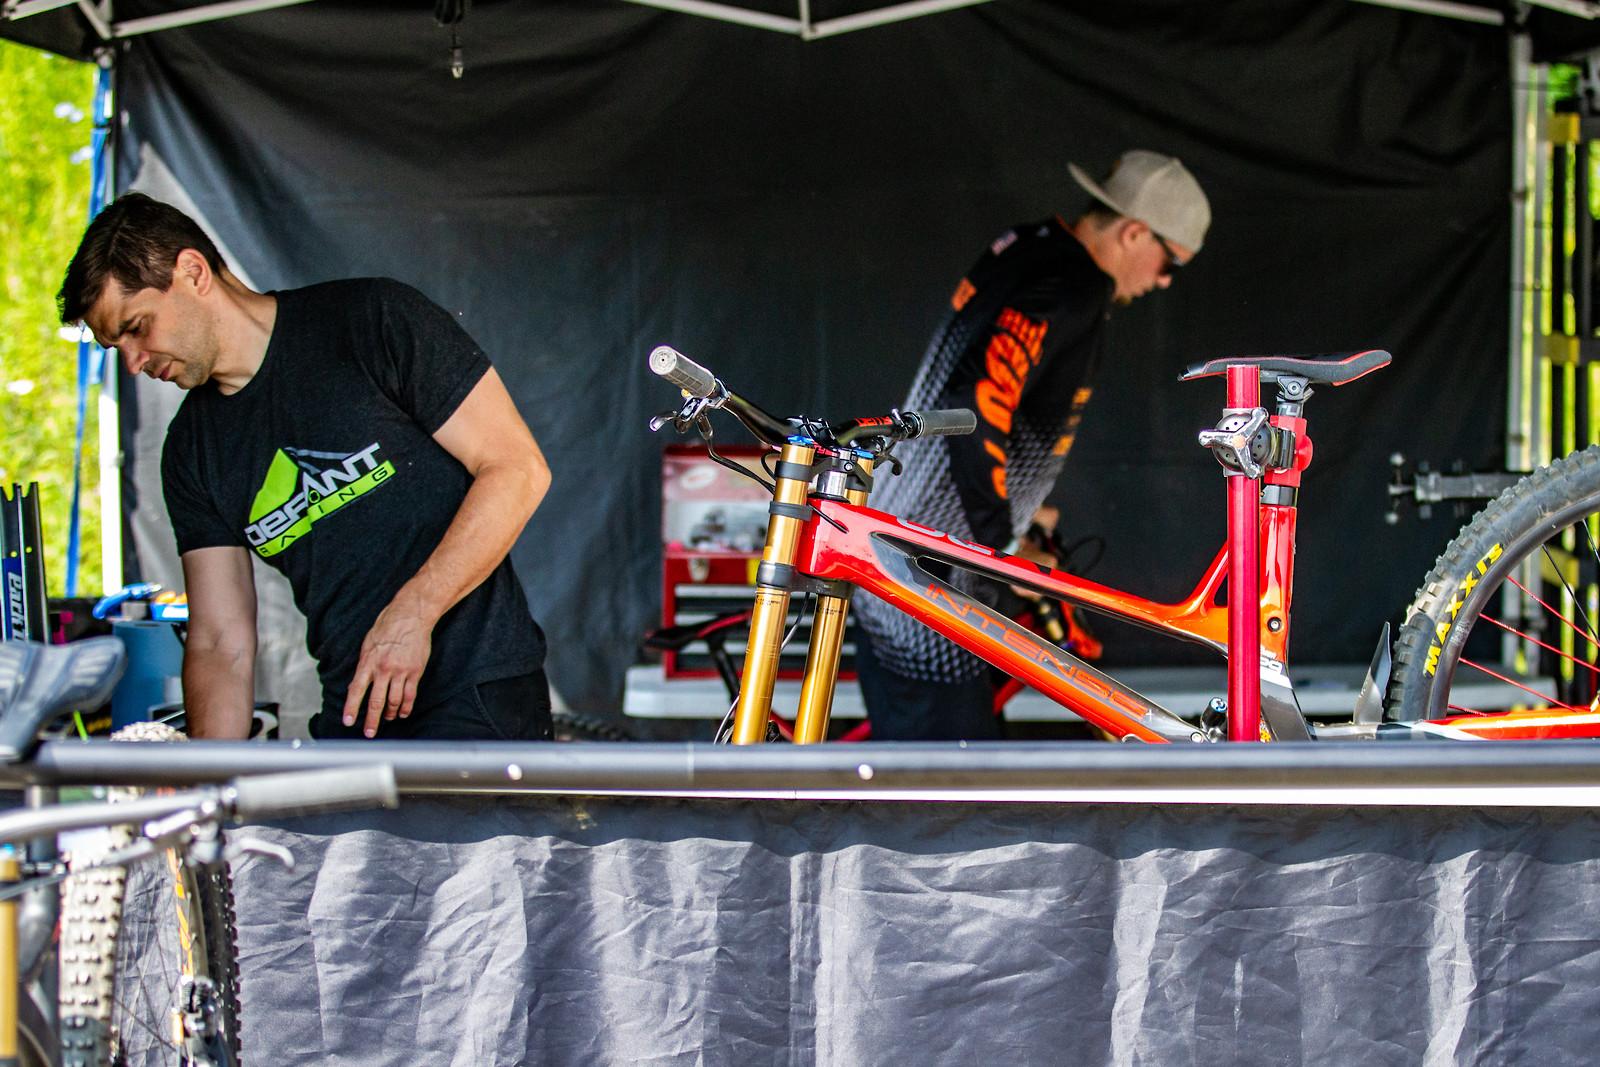 Defiant Racing Pits - JackRice - Mountain Biking Pictures - Vital MTB